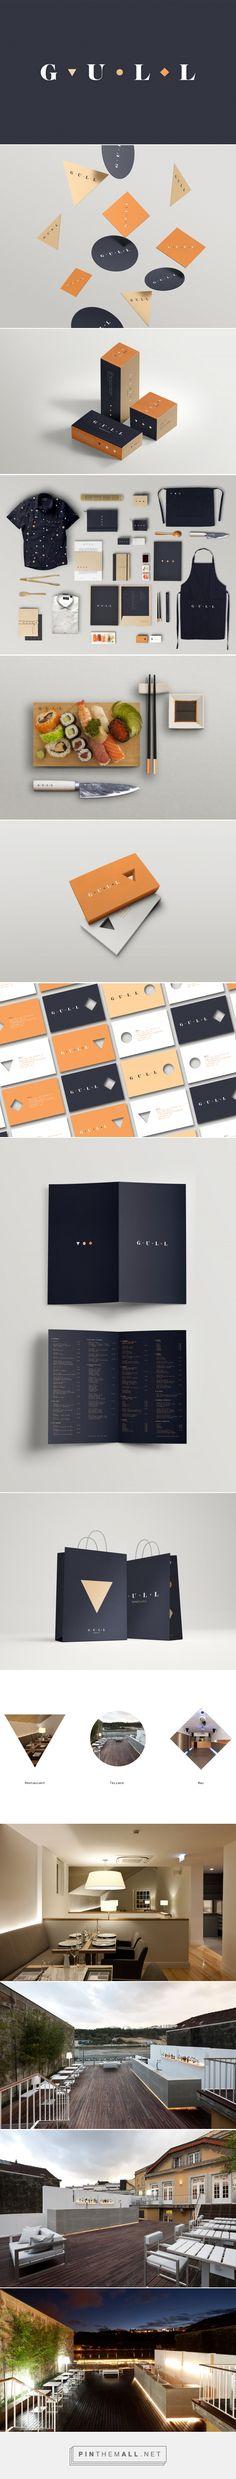 Gull Restaurant Branding by Volta Fivestar Branding – Design and Branding Agency & Inspiration Gallery Web Design Agency, Brand Identity Design, Graphic Design Branding, Menu Design, Corporate Design, Branding Agency, Business Branding, Identity Branding, Corporate Identity